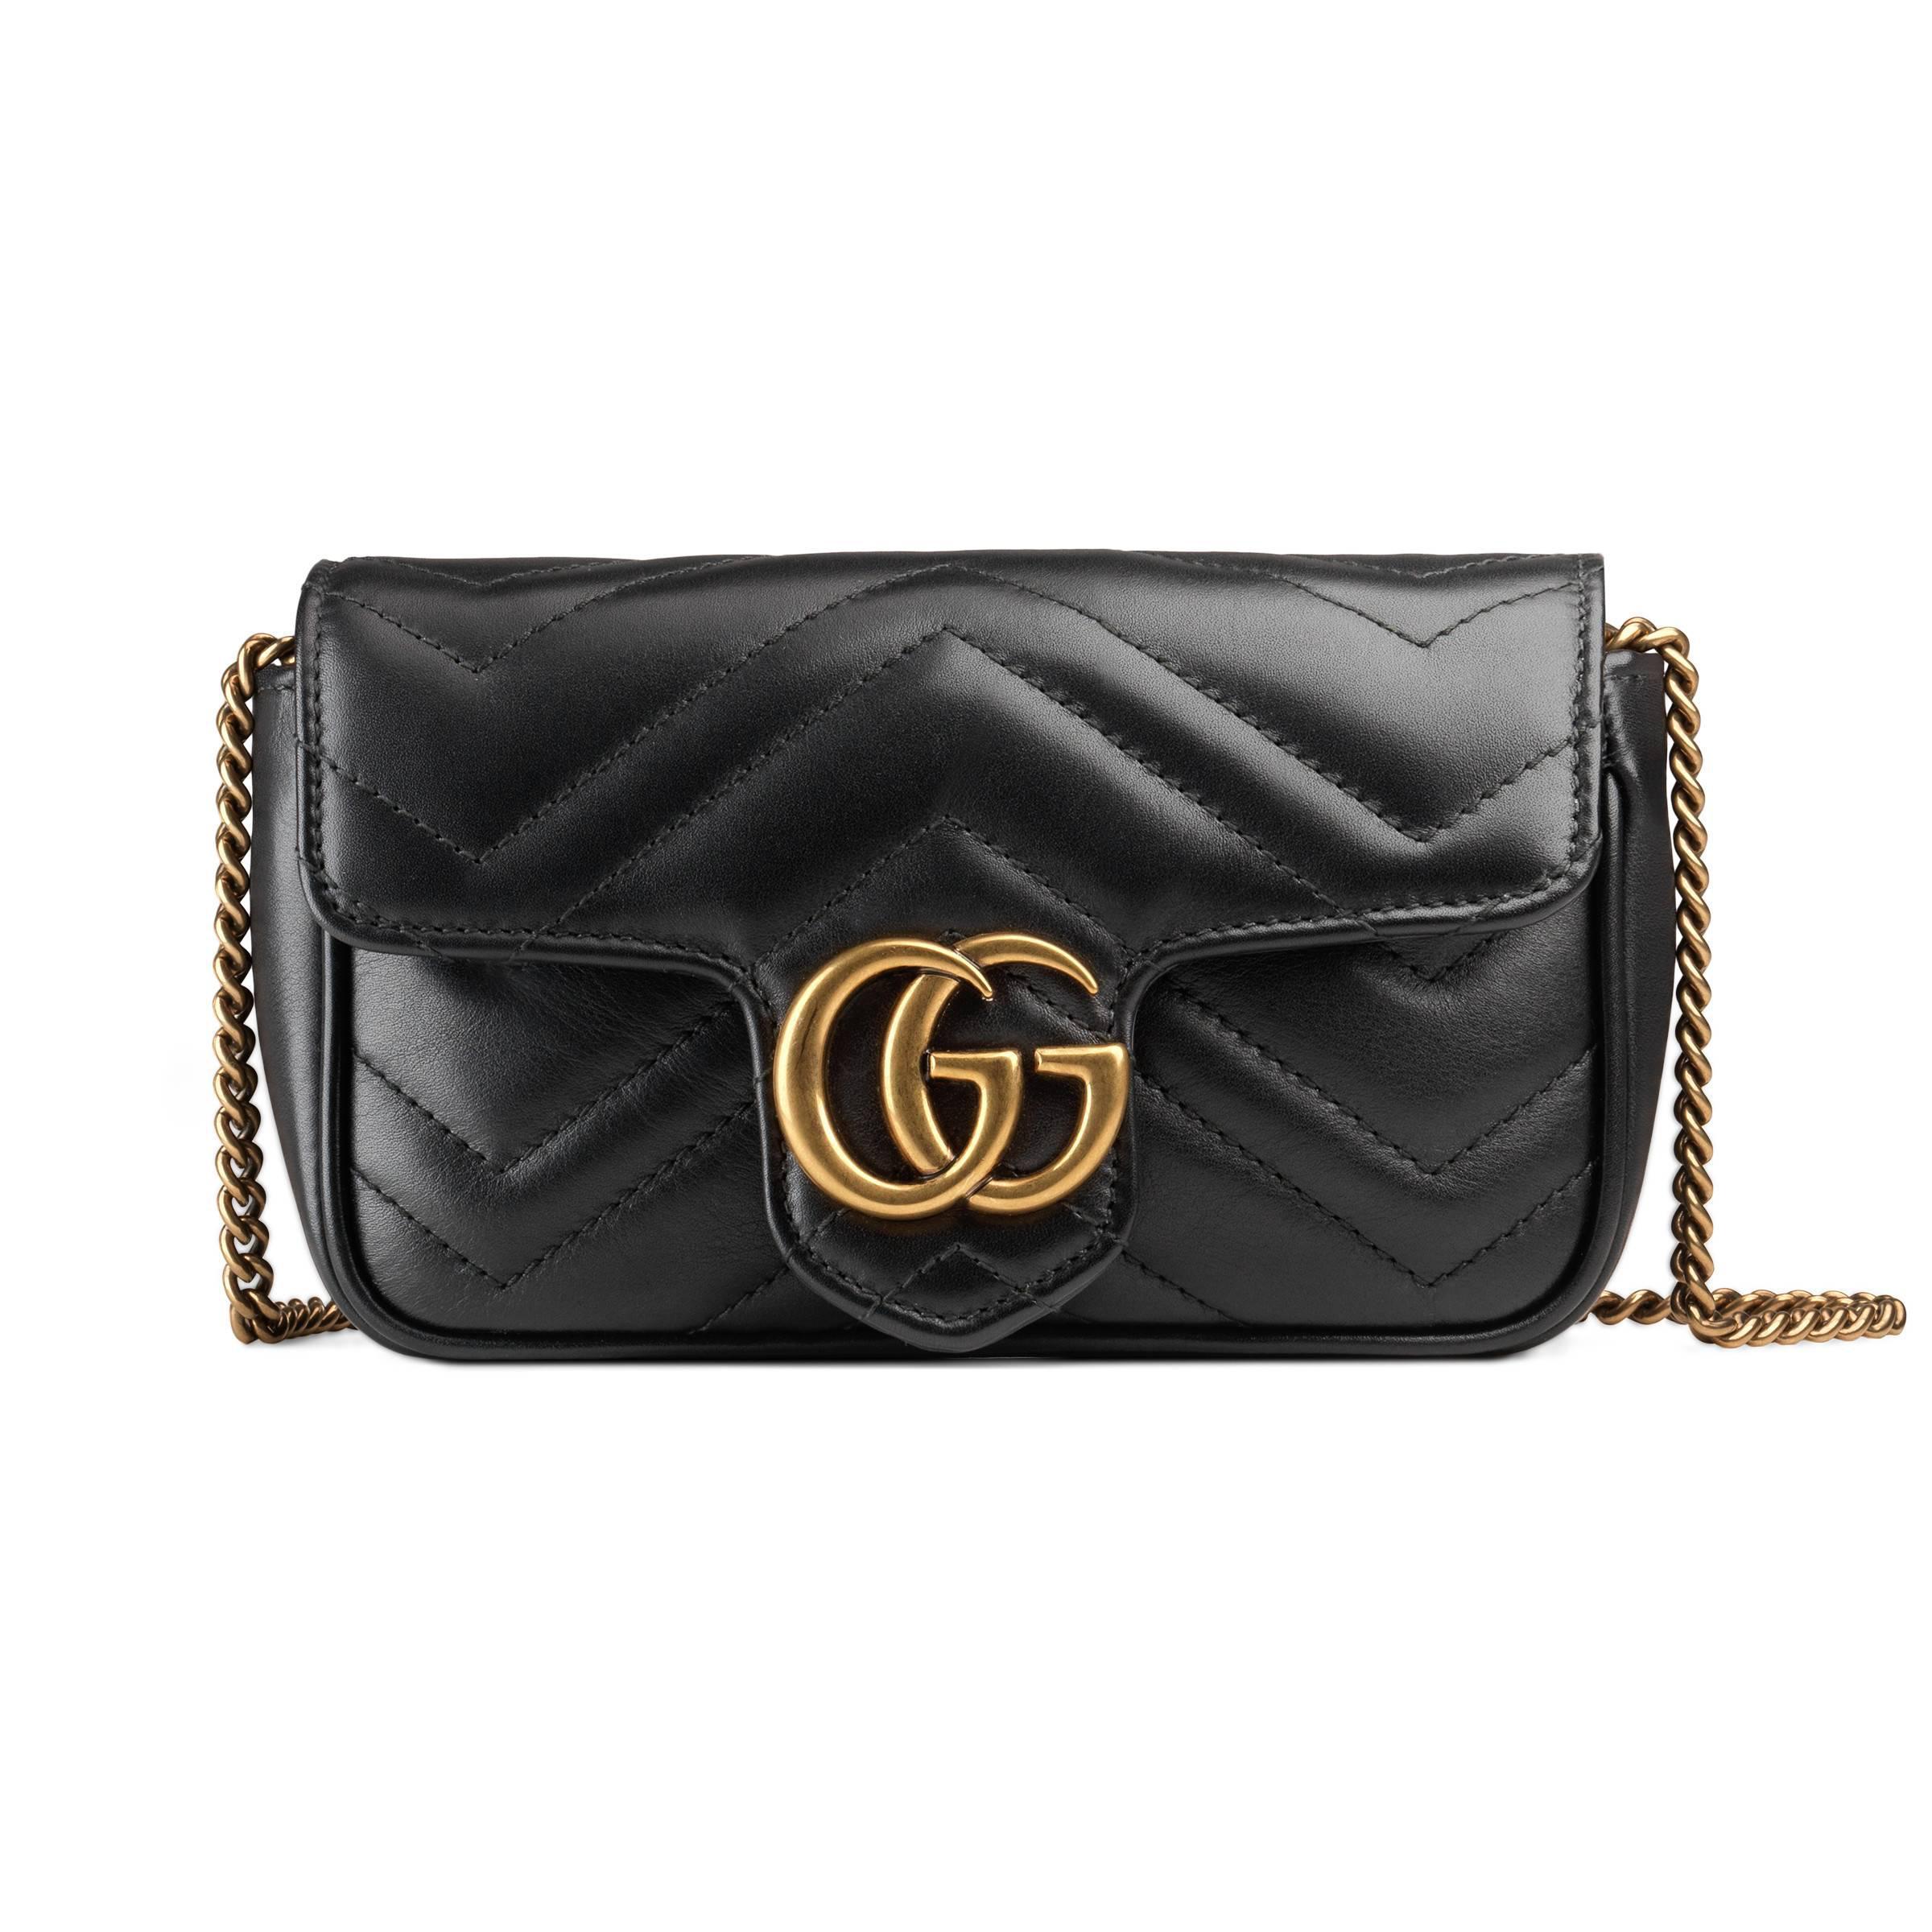 9c018b9e63e8a Gucci - Black GG Marmont Super-Mini-Tasche aus Matelassé-Leder - Lyst.  Vollbild ansehen